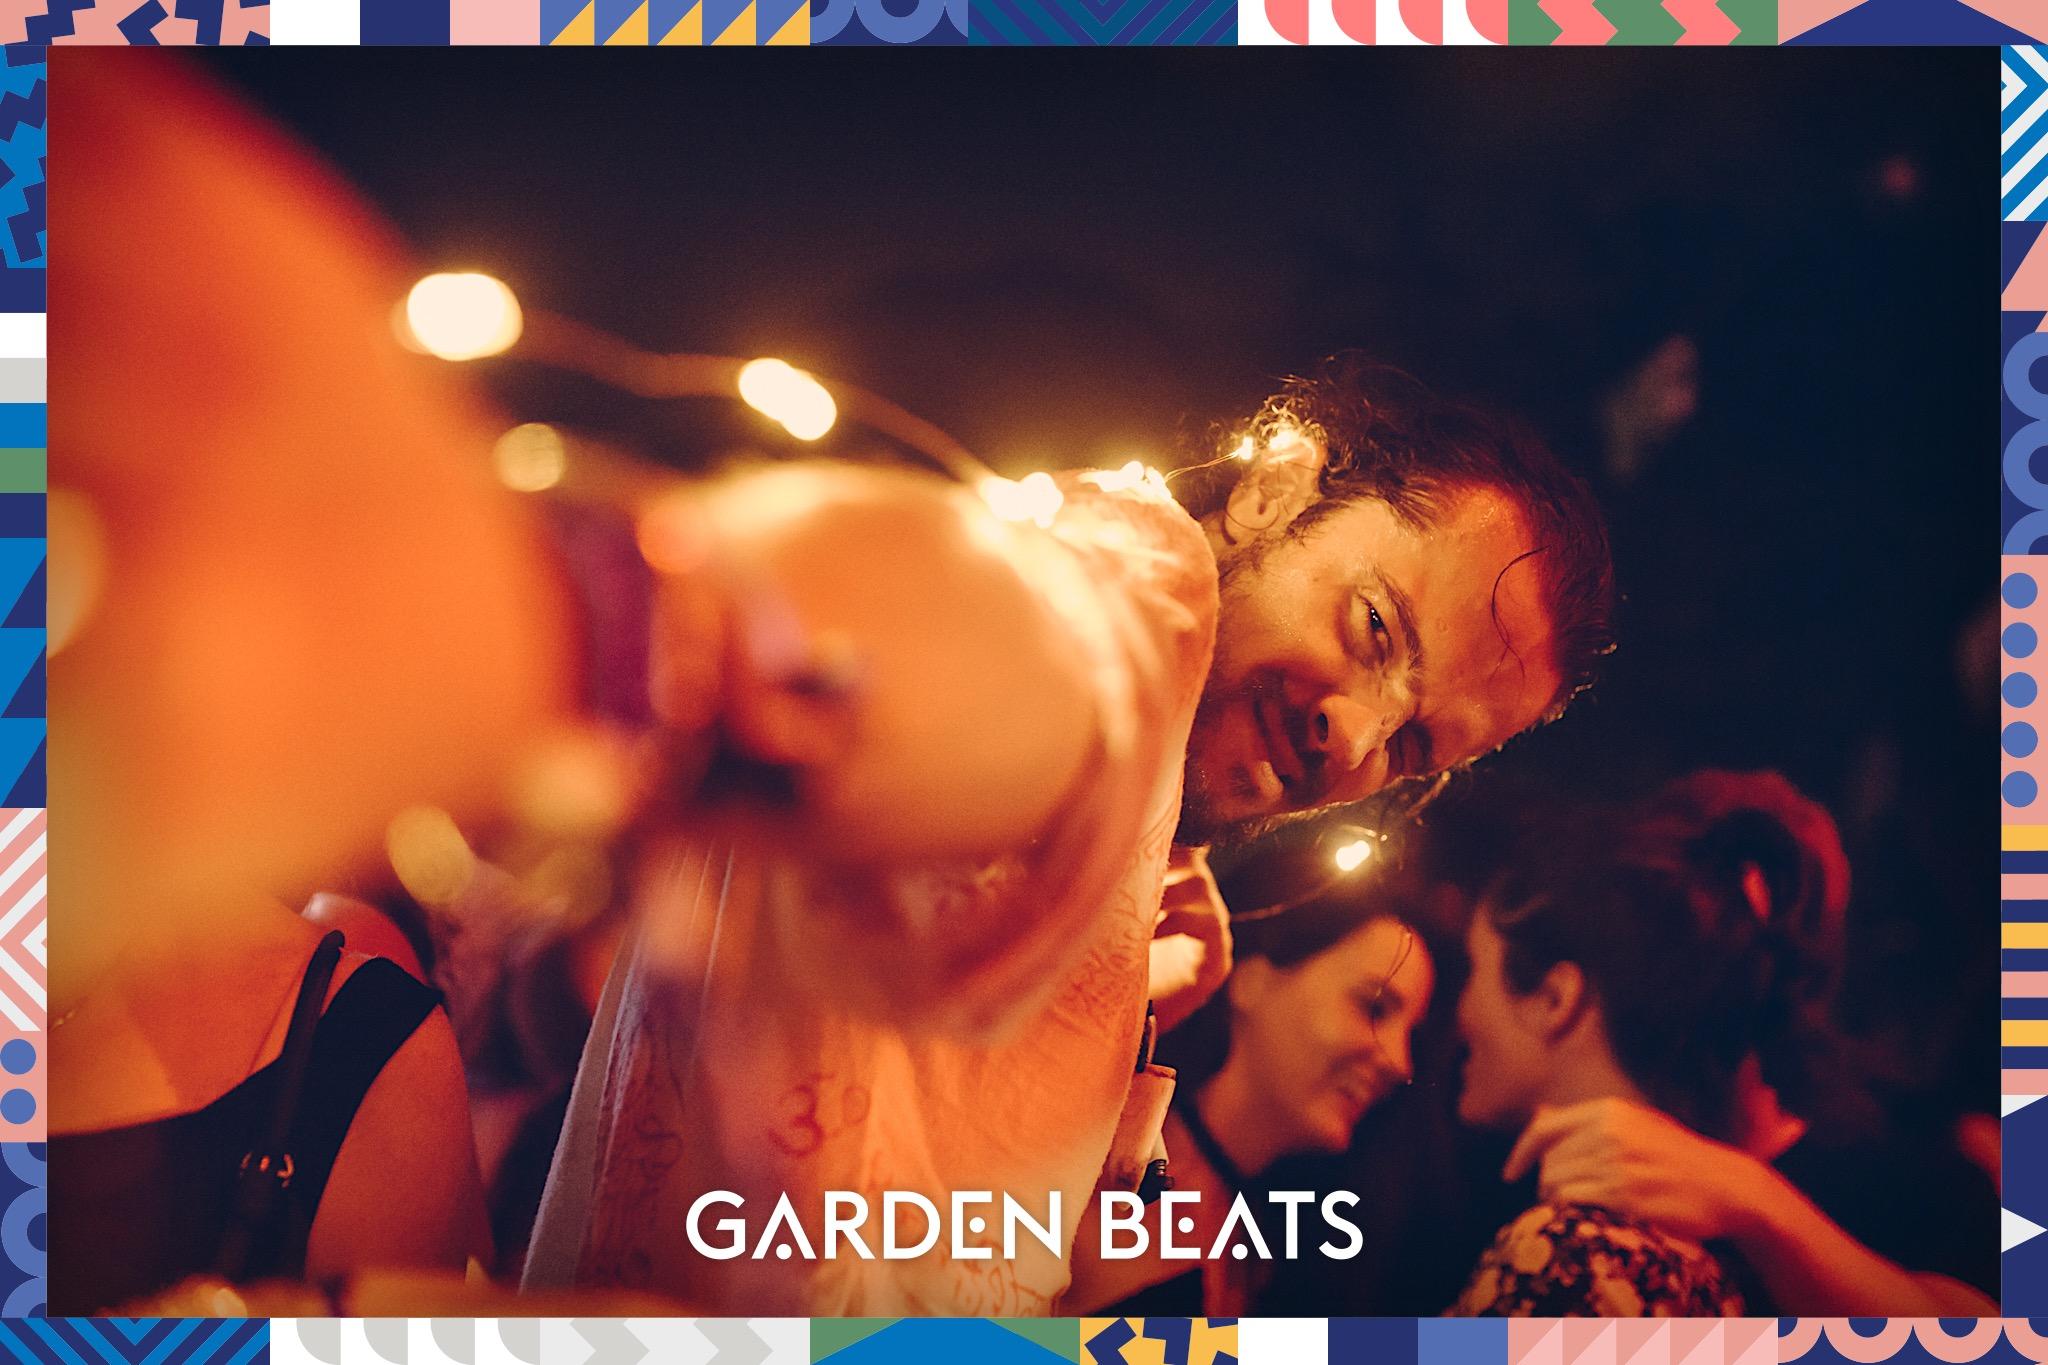 18032017_GardenBeats_Colossal894_WatermarkedGB.jpg